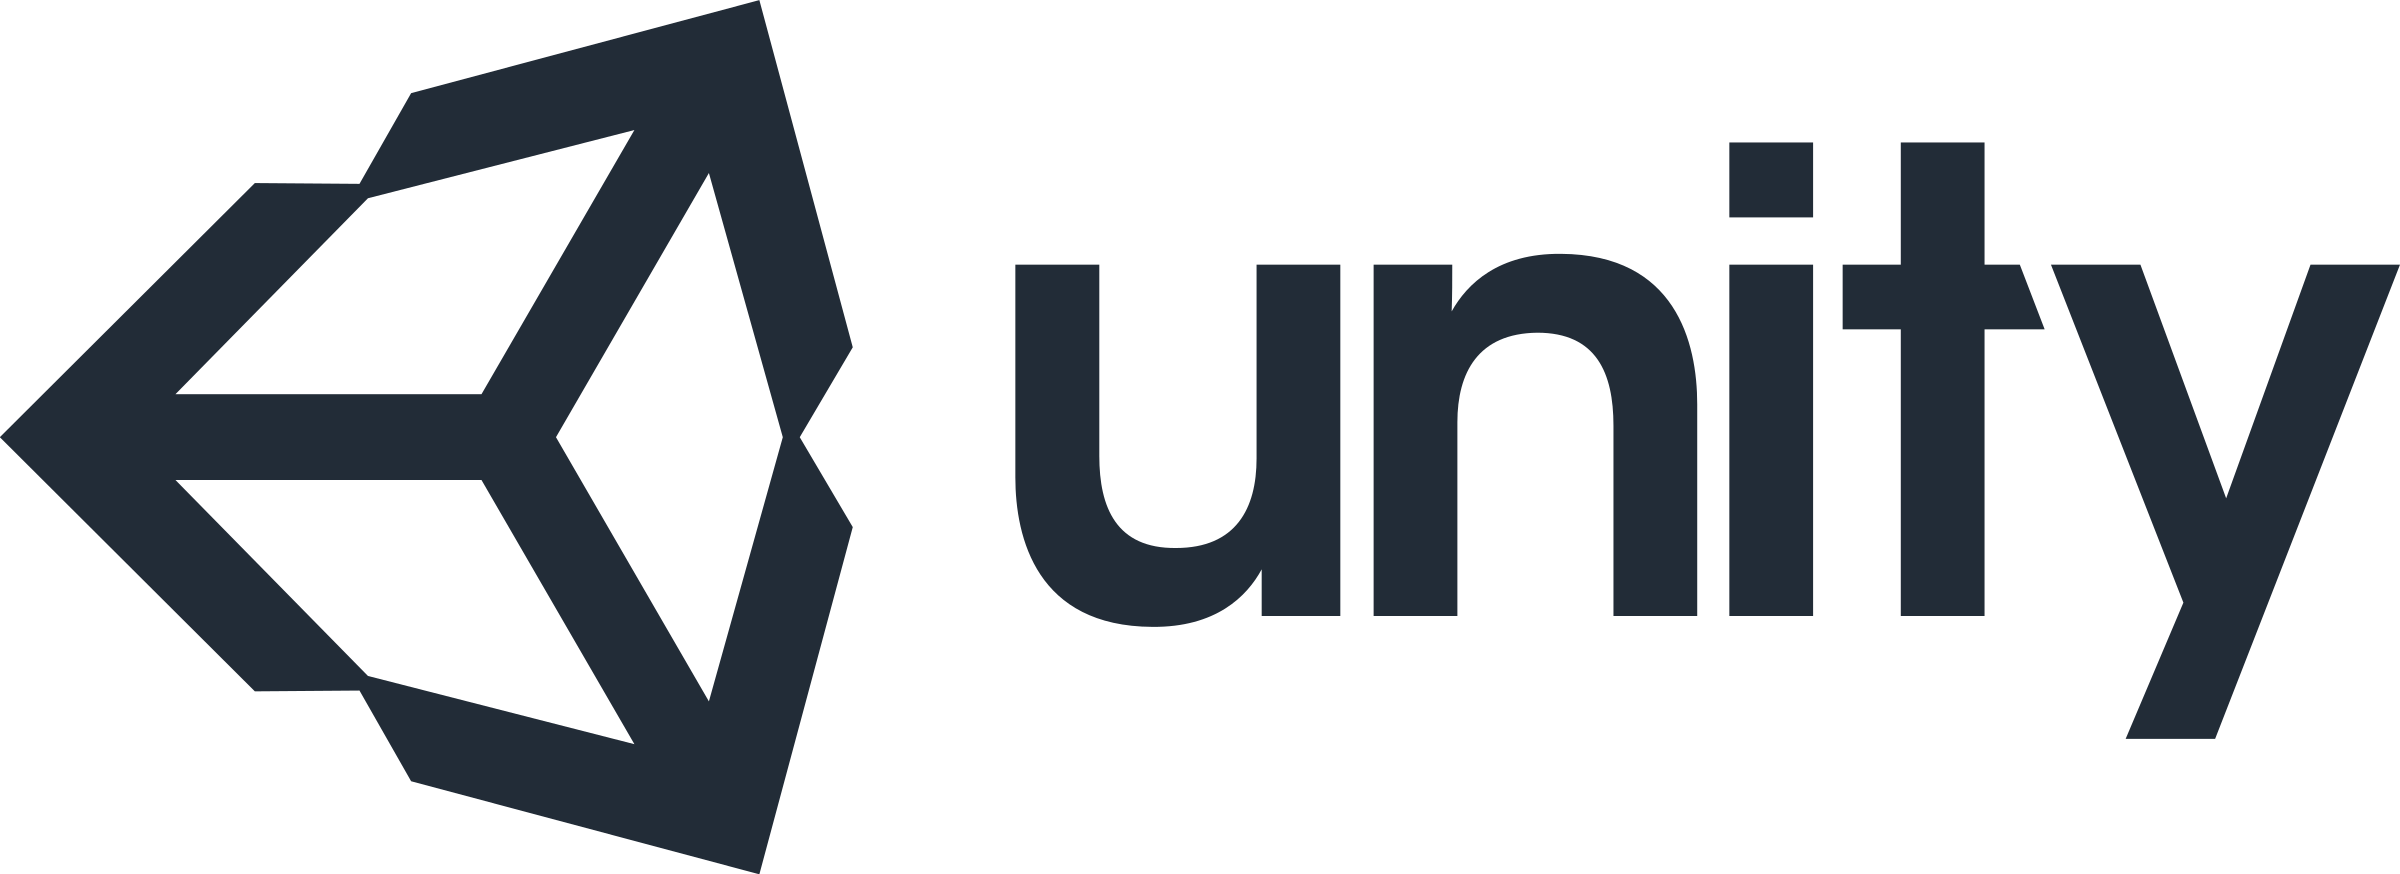 Pin By Erik Paynter On Unity Unity Games Unity Logo Game Engine